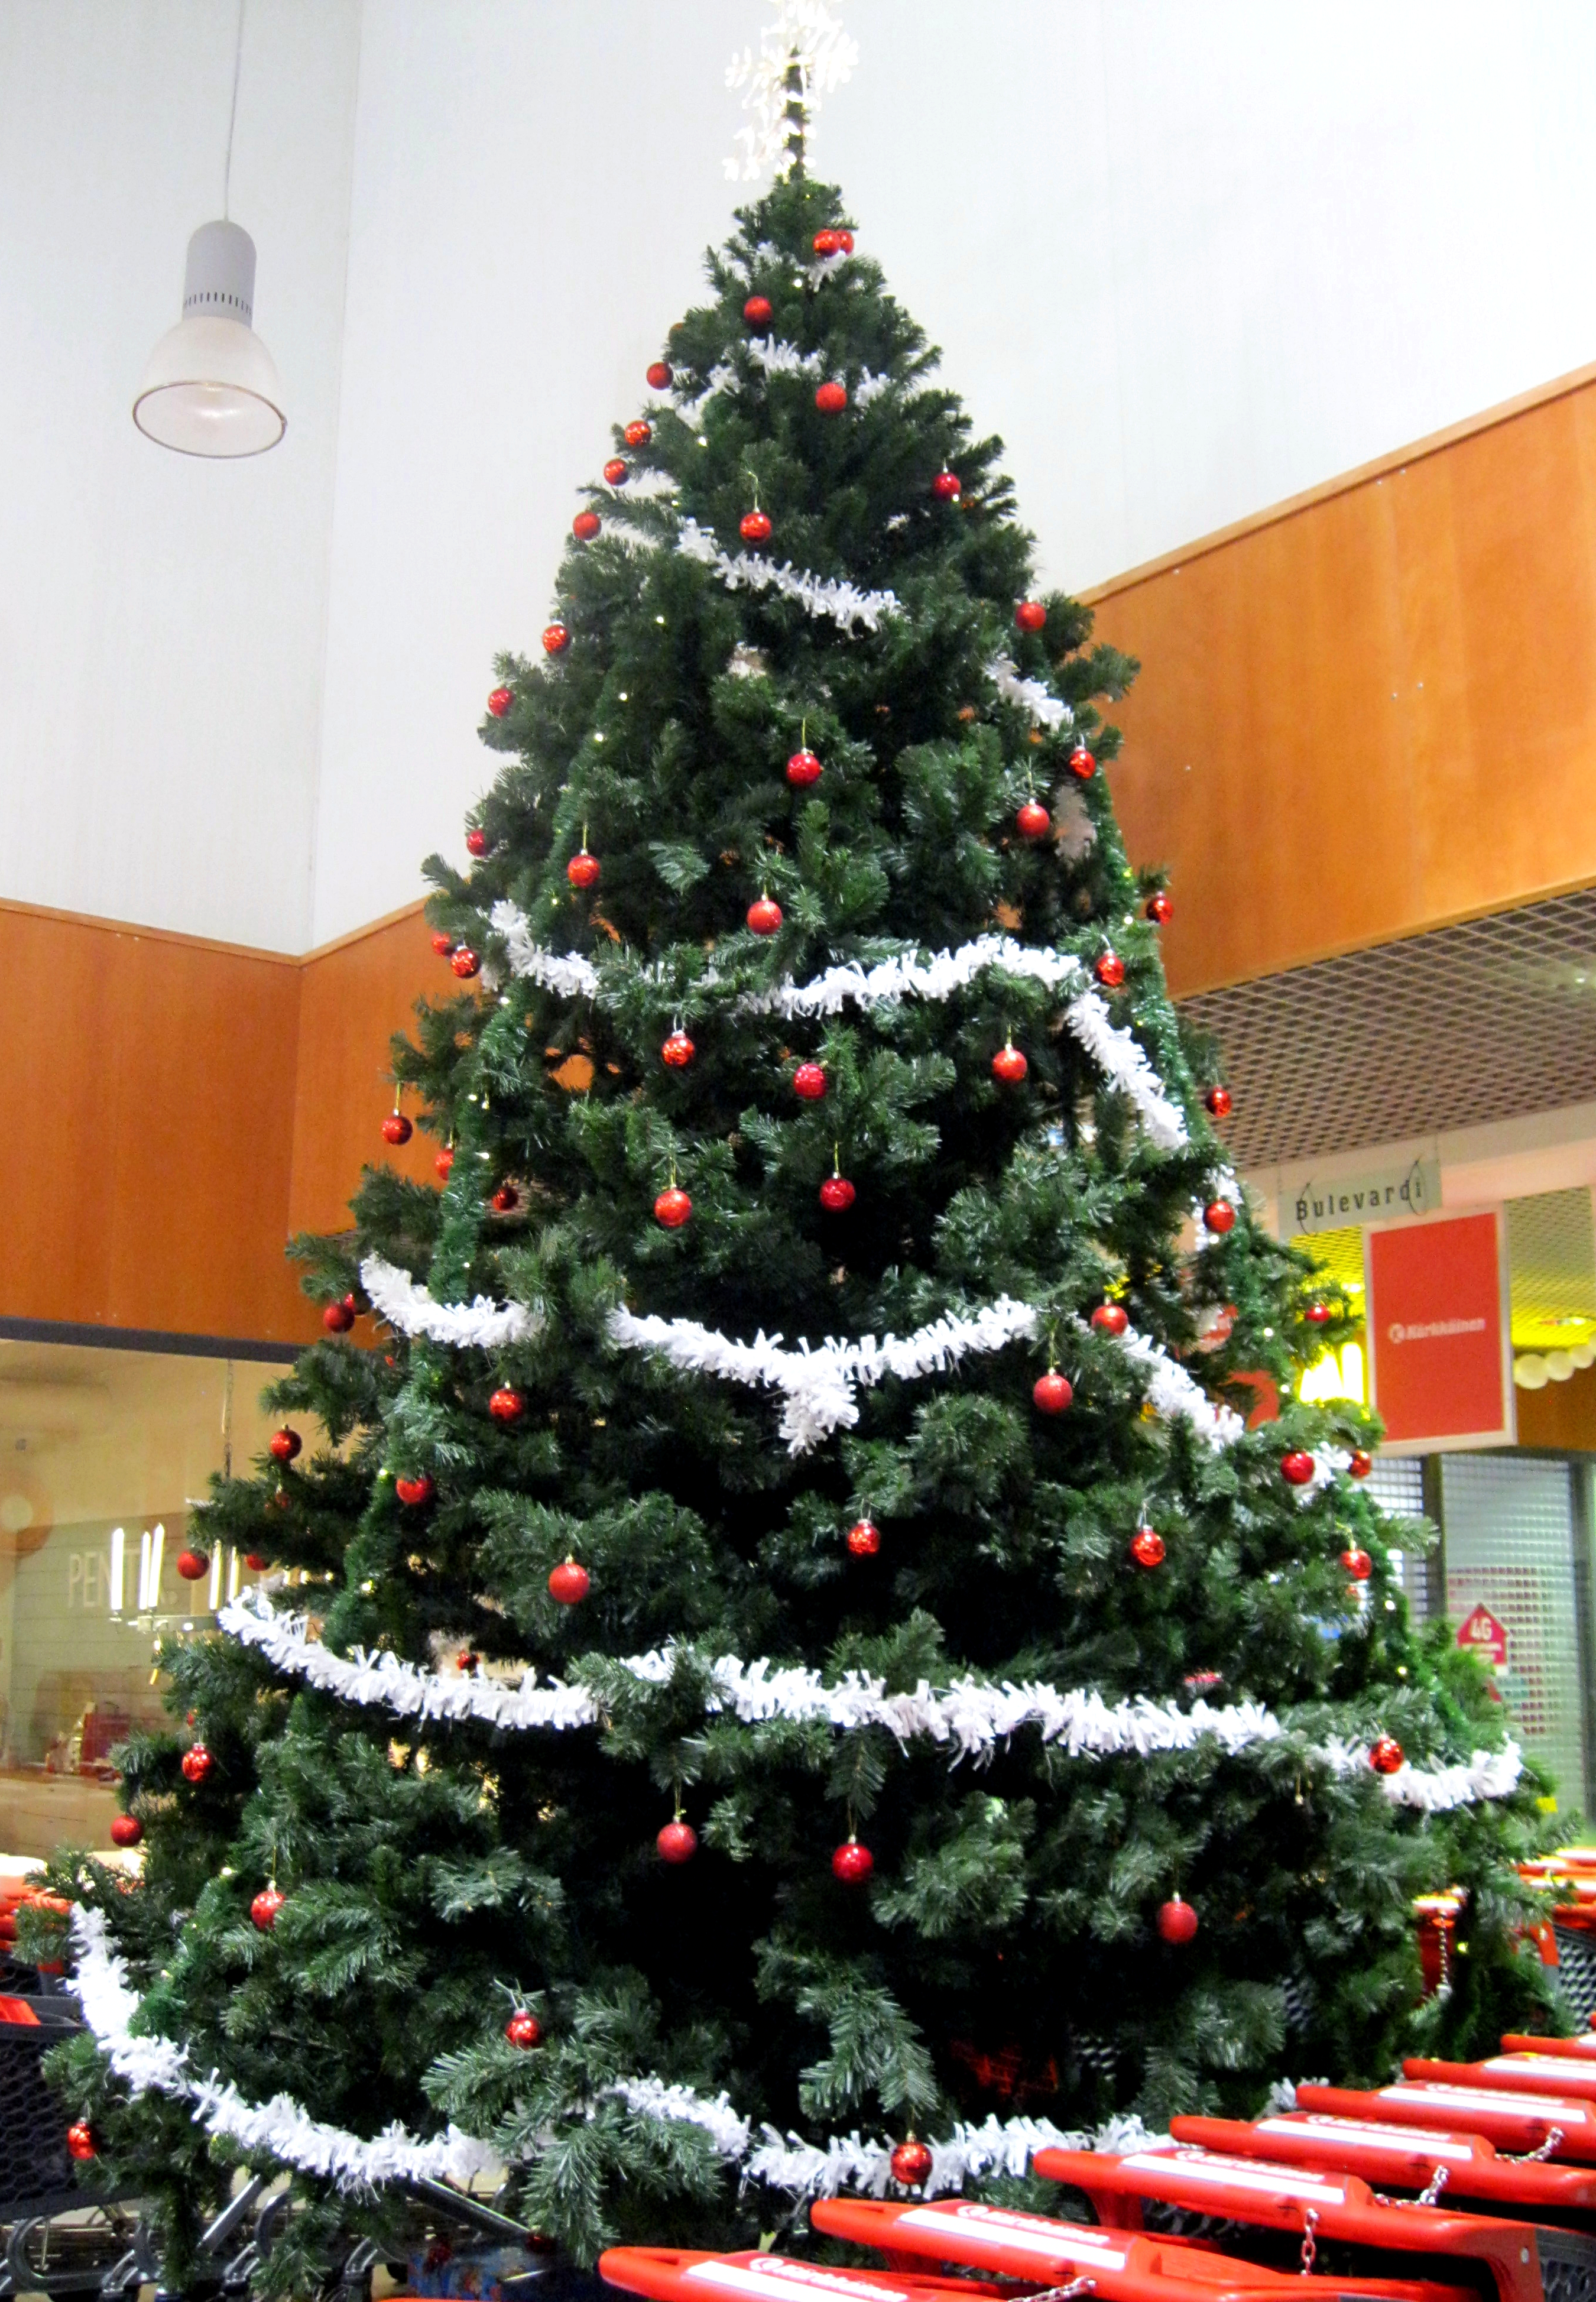 filechristmas tree in j krkkinenjpg - 10 Christmas Tree